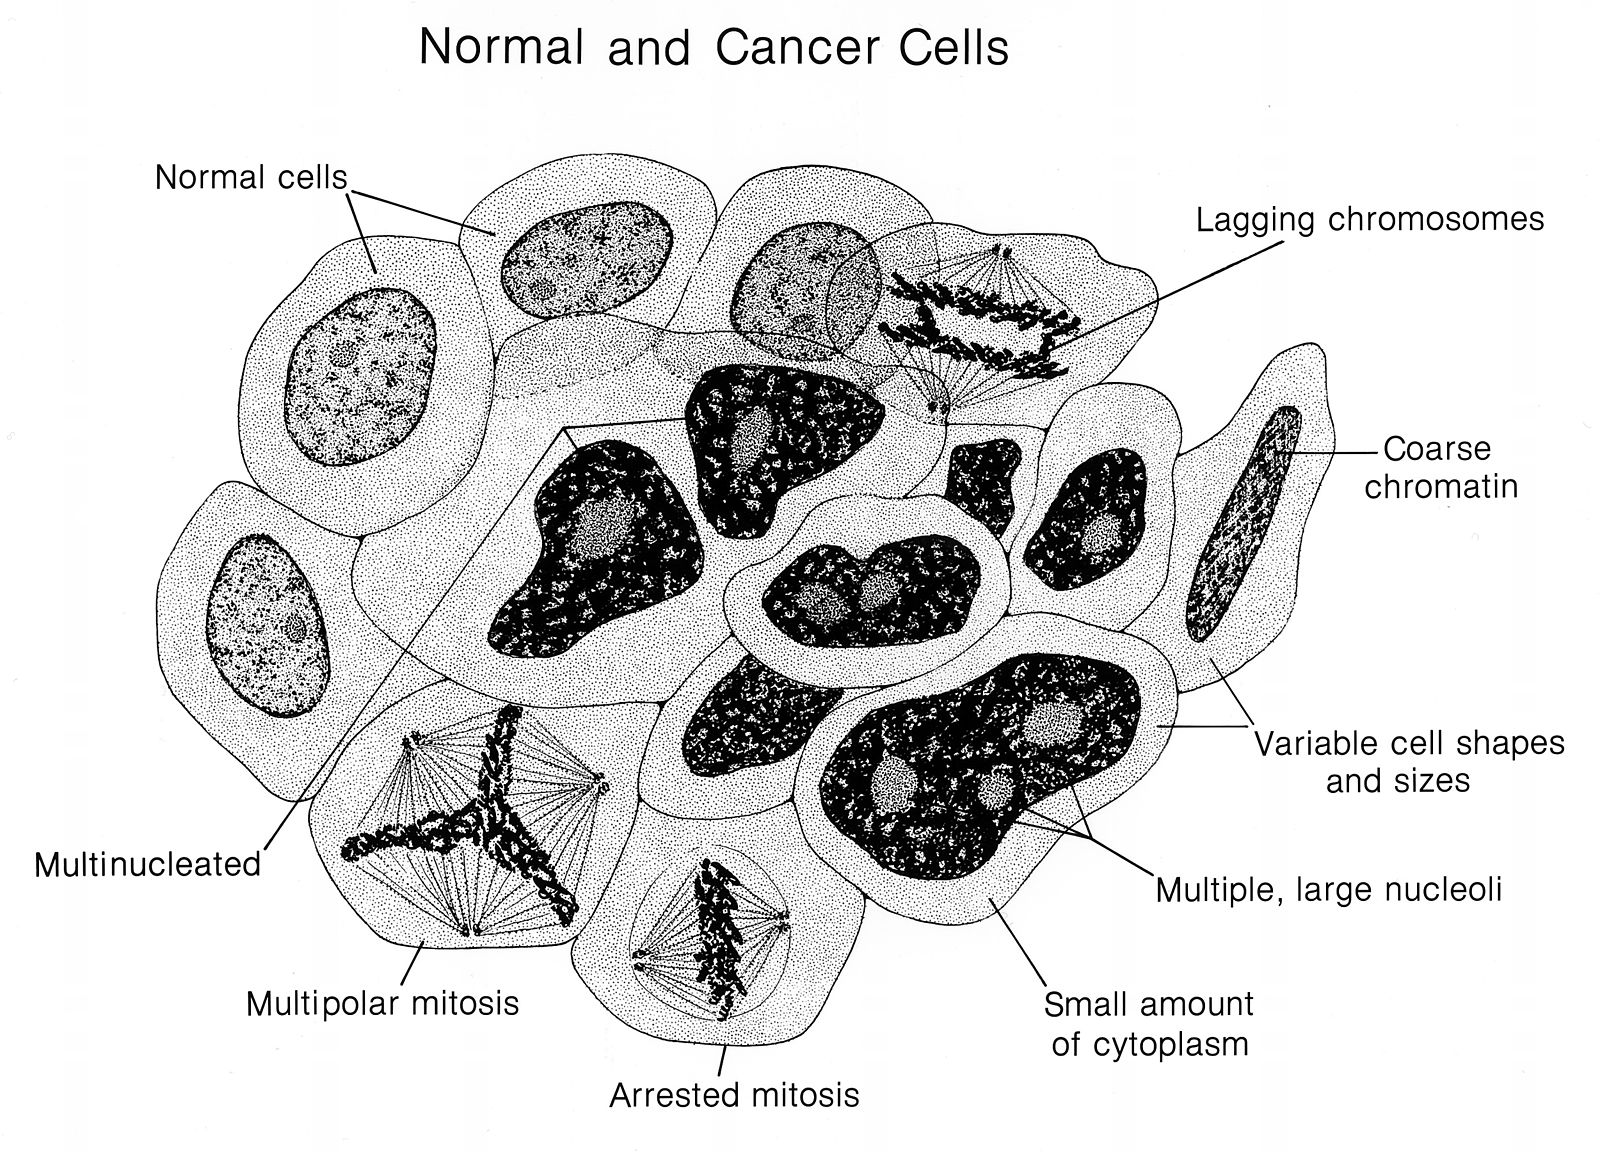 File:Normal and cancer cells (labeled) illustration.jpg